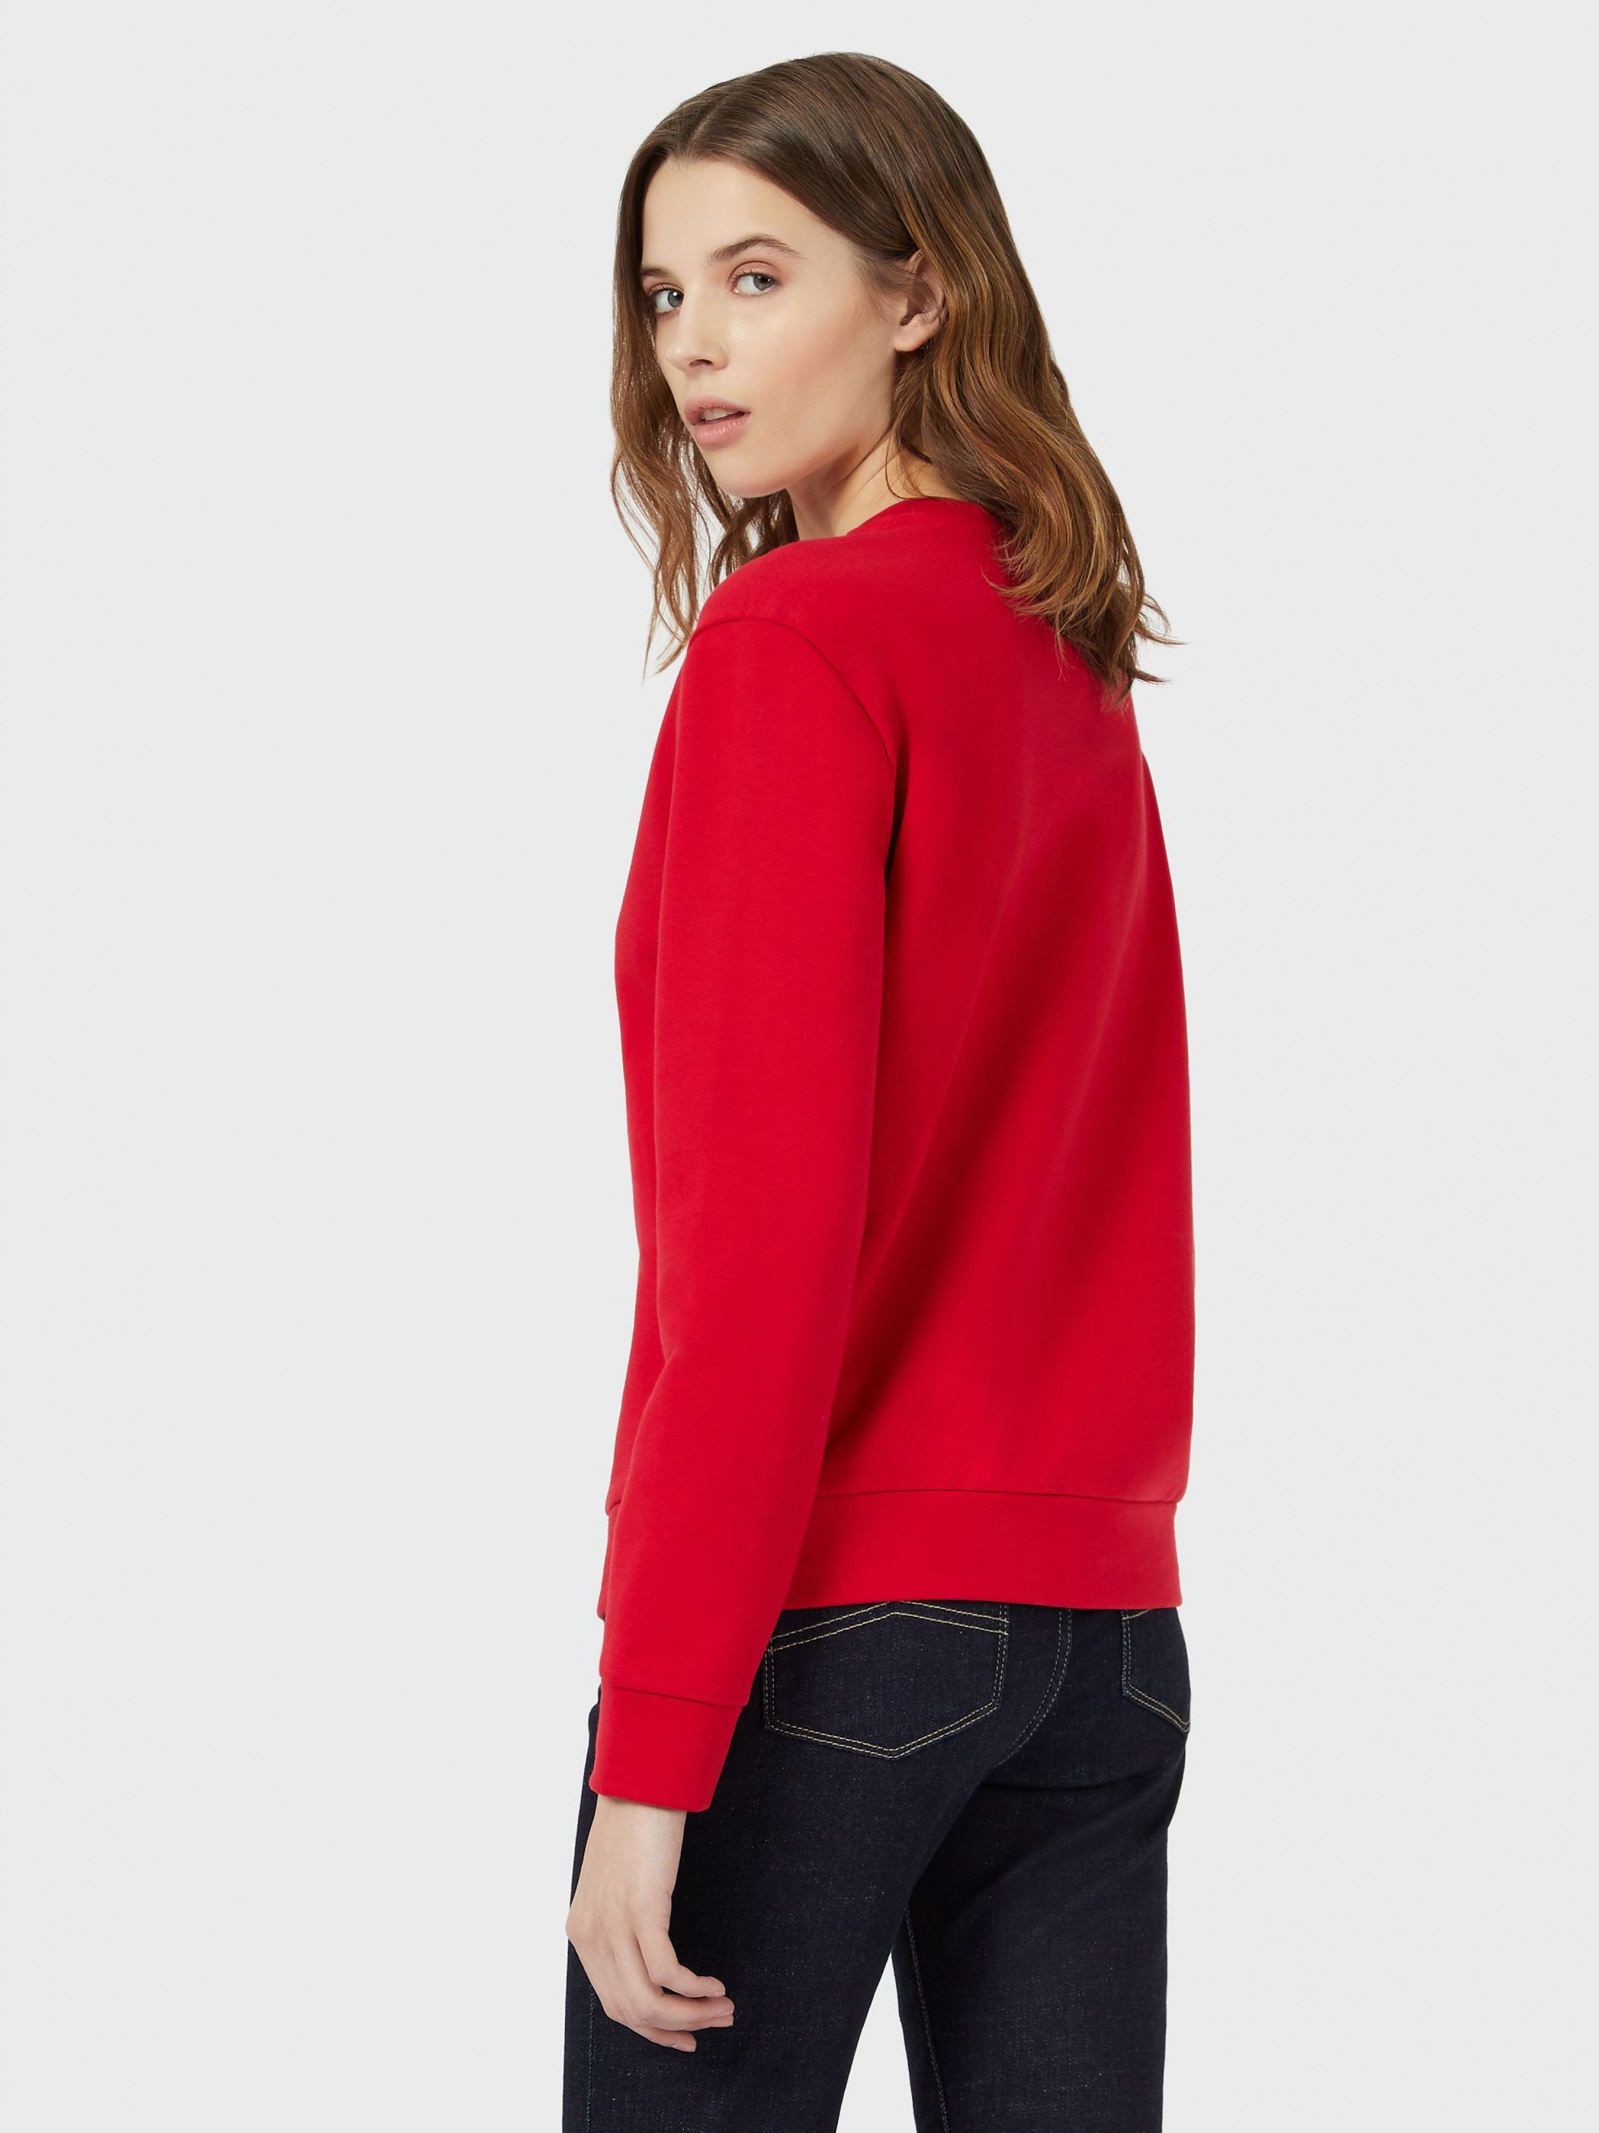 Кофты и свитера женские Emporio Armani модель 5P774 приобрести, 2017